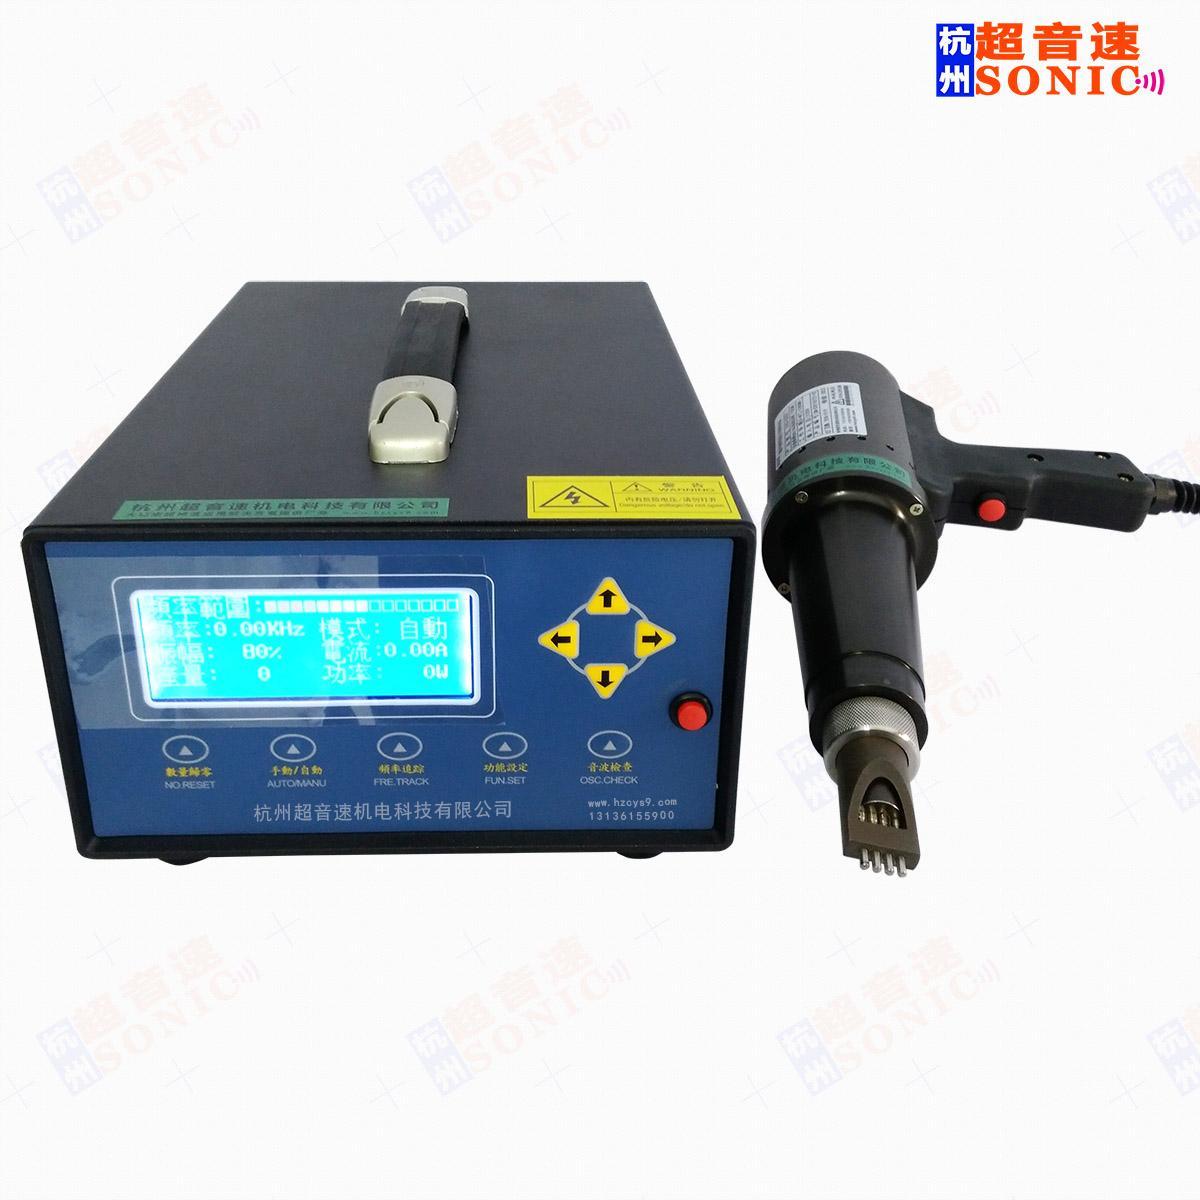 CYS-C20超聲波焊接應力消除設備 4